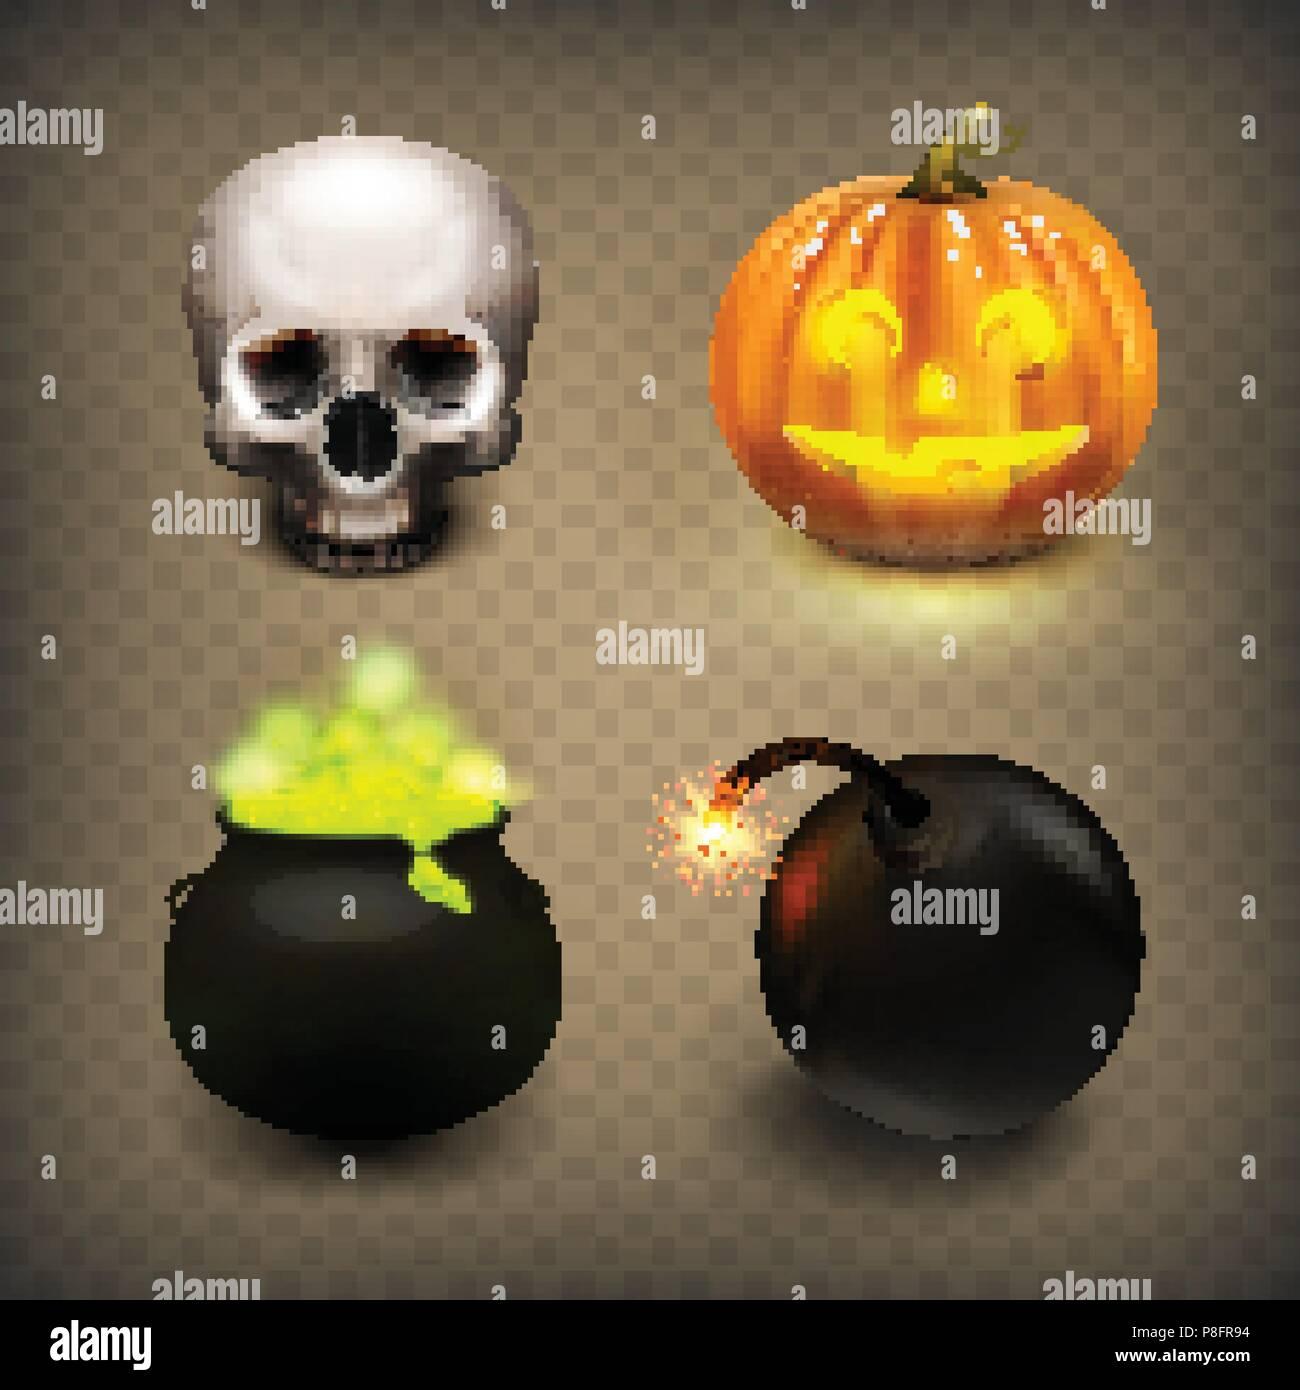 Stock Vector Illustration Realistic Skull Jack O Lantern Witches Cauldron Bomb Halloween Set Isolated On A Transparent Background Halloween Pumpkin Jack O Lantern Brewed Potion Eps 10 Stock Vector Image Art Alamy